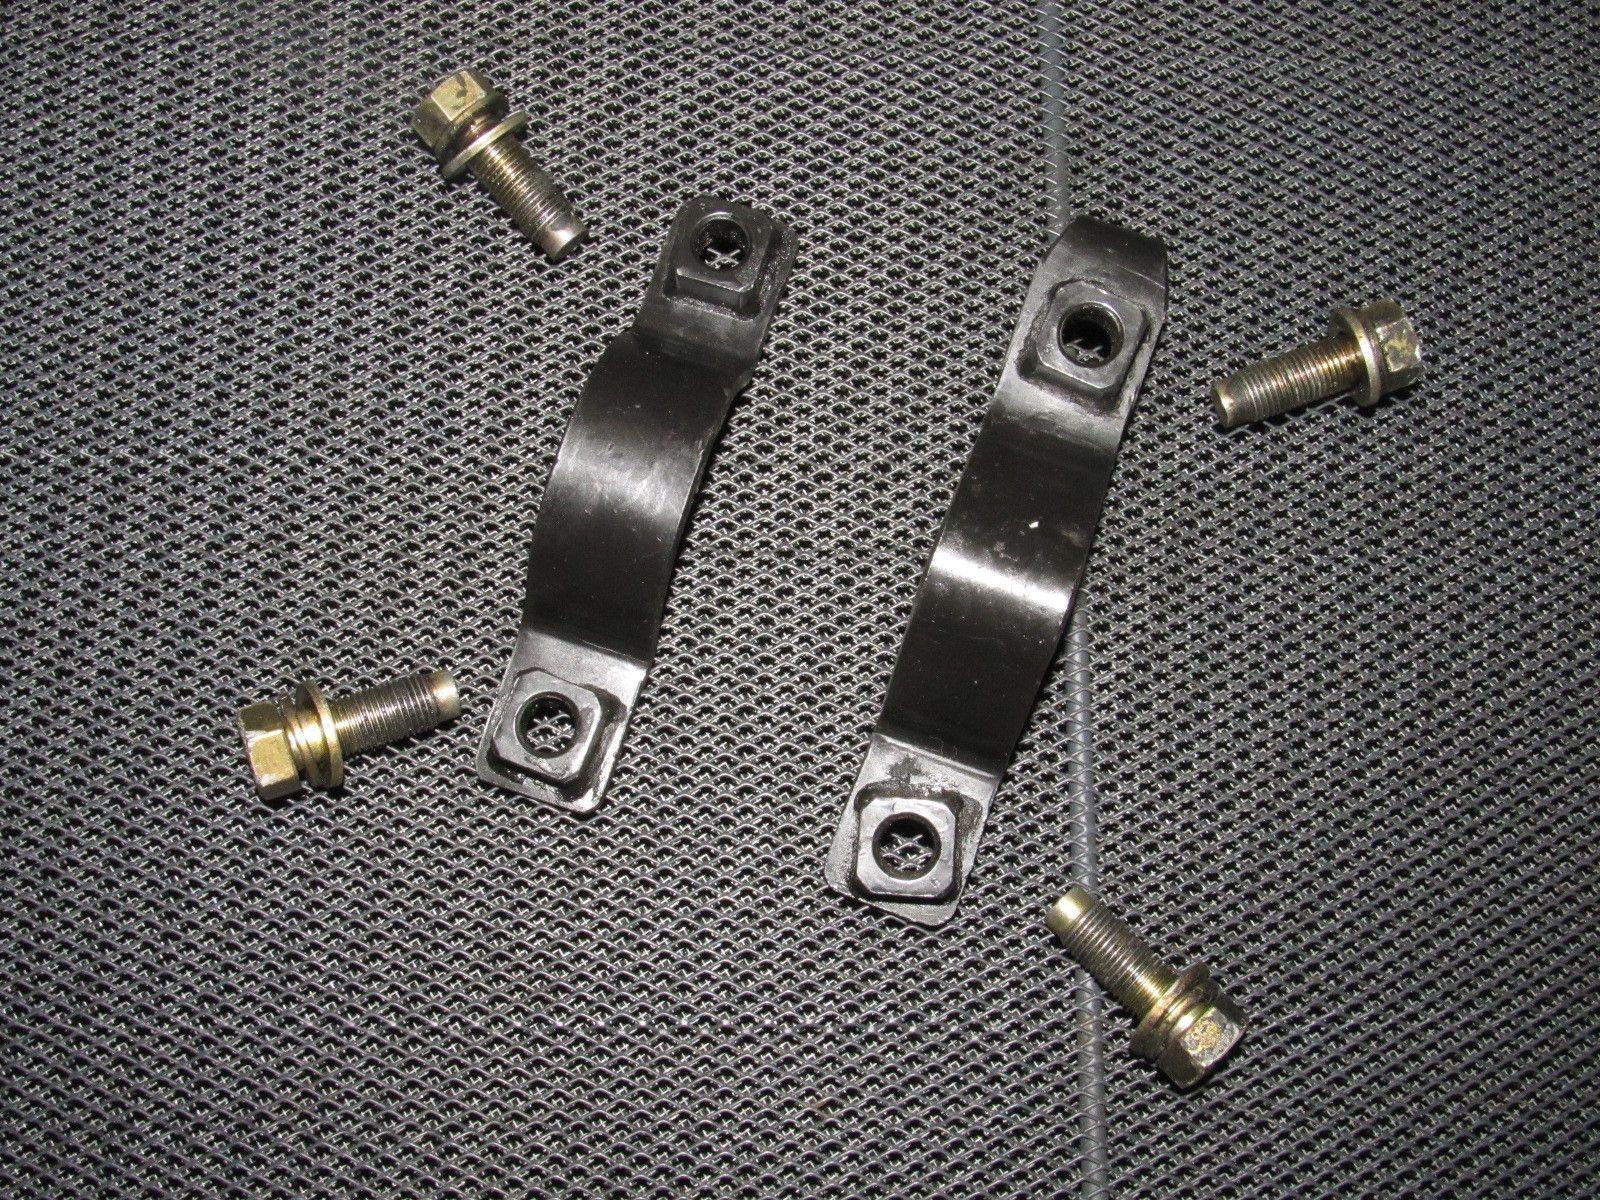 91 92 93 94 nissan 240sx oem front steering rack mounting bracket  91 92 93 94 nissan 240sx oem front steering rack mounting bracket